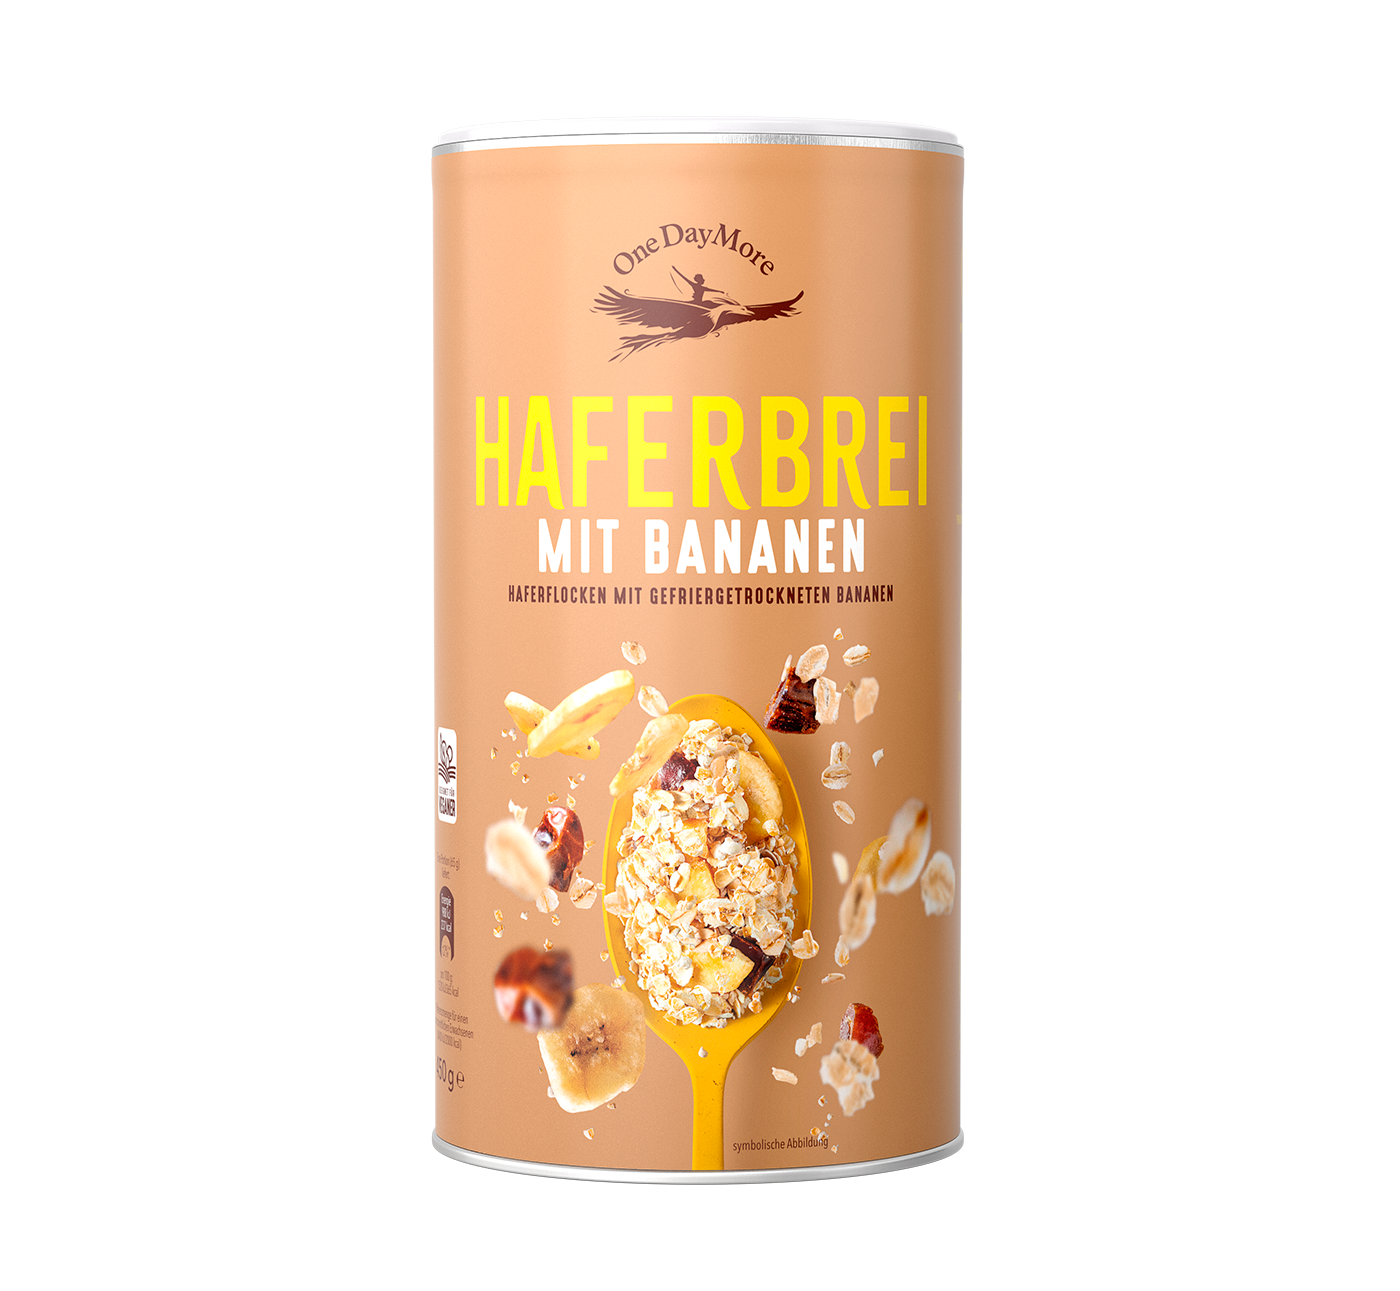 haferbrei-mit-bananen-musli-onedaymore-tuba-front-1400×1291